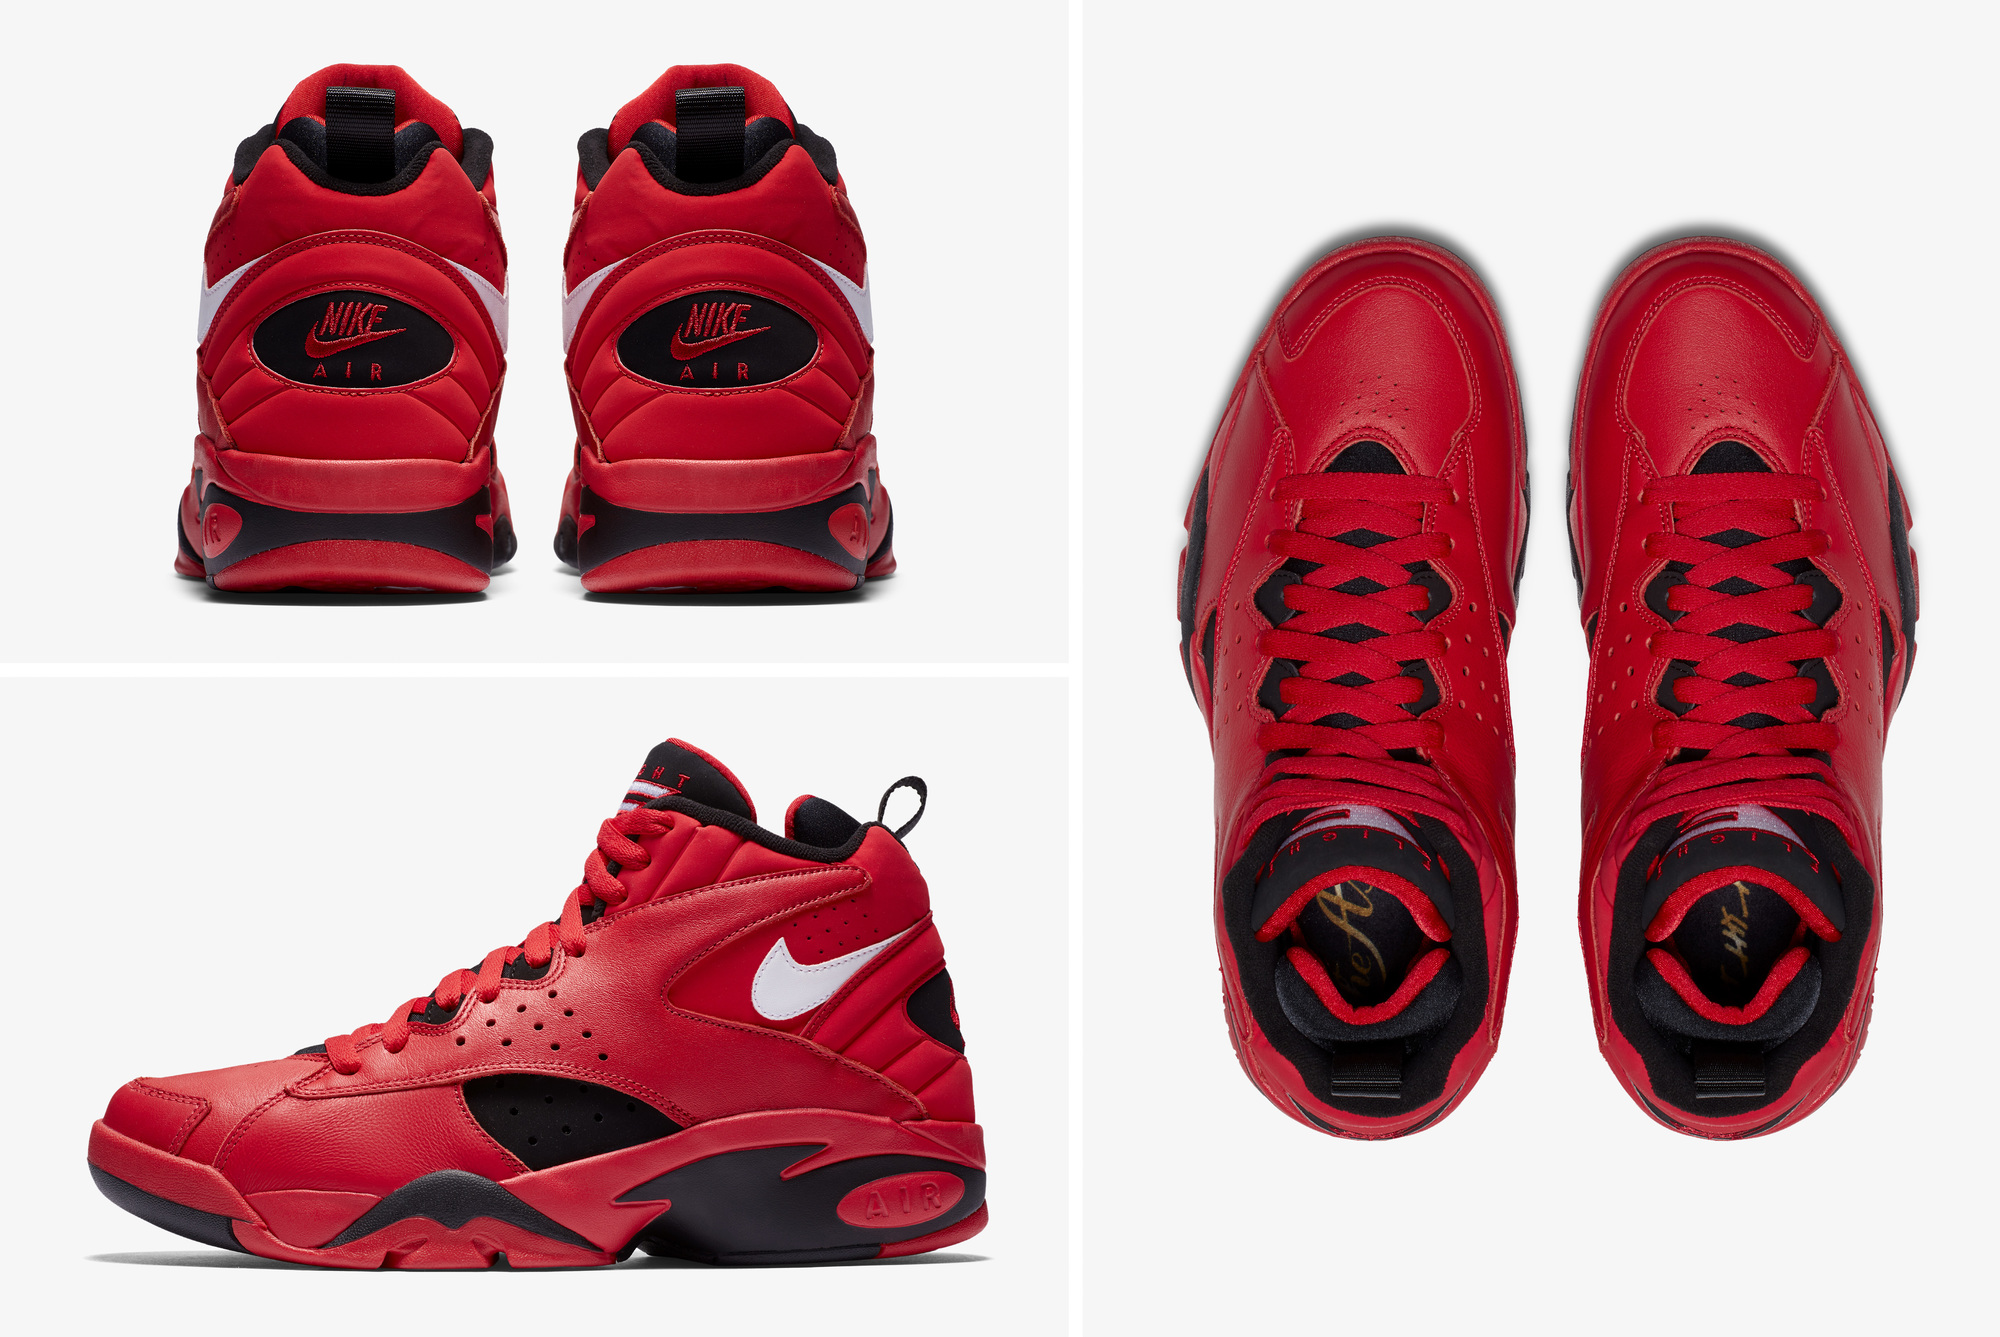 Nike Air Maestro II trifecta scottie pippen